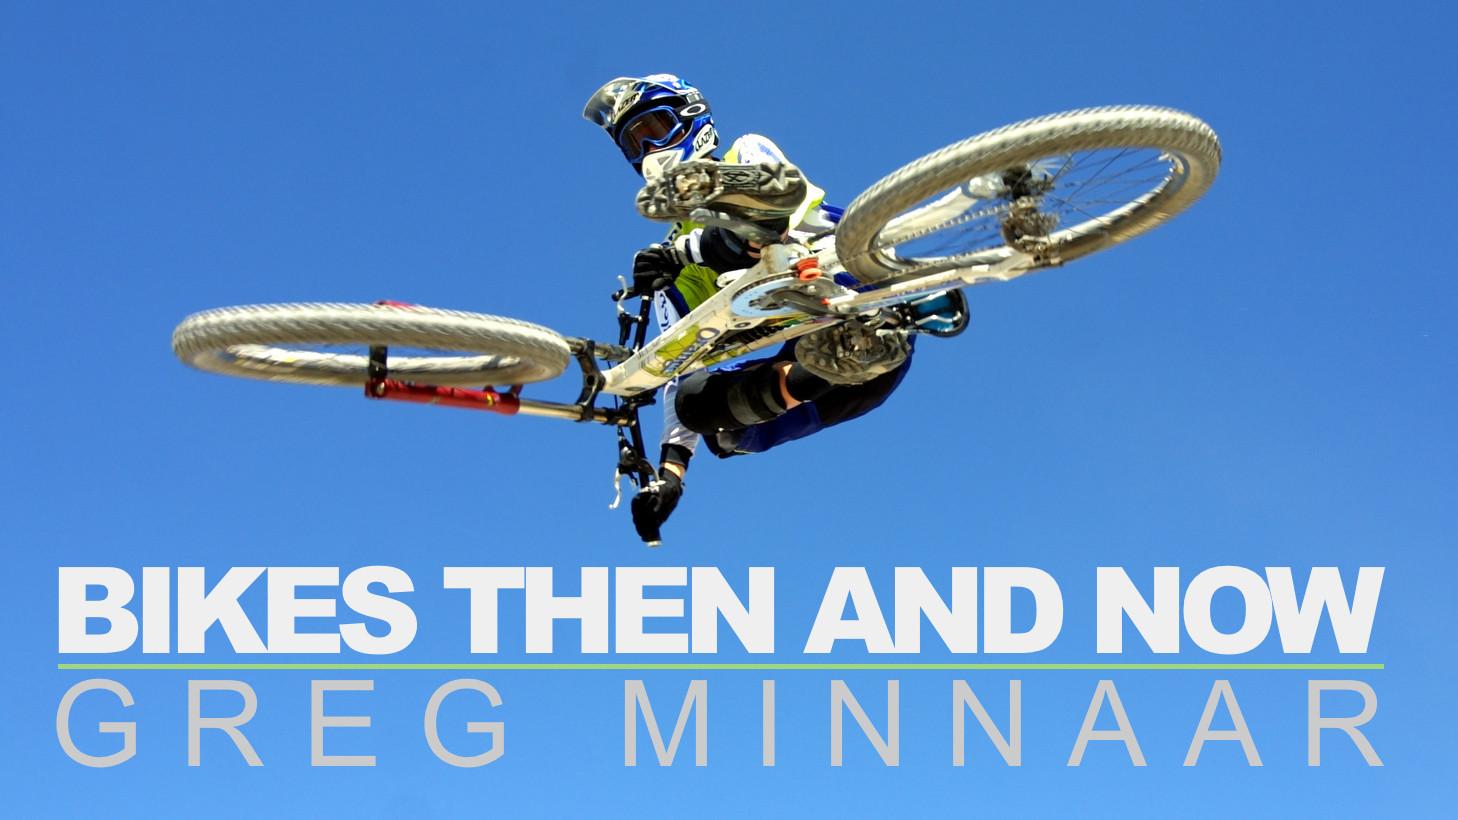 Bikes Then and Now: Greg Minnaar's Rides from 2001-2015 - Bikes Then and Now - Greg Minnaar - Mountain Biking Pictures - Vital MTB